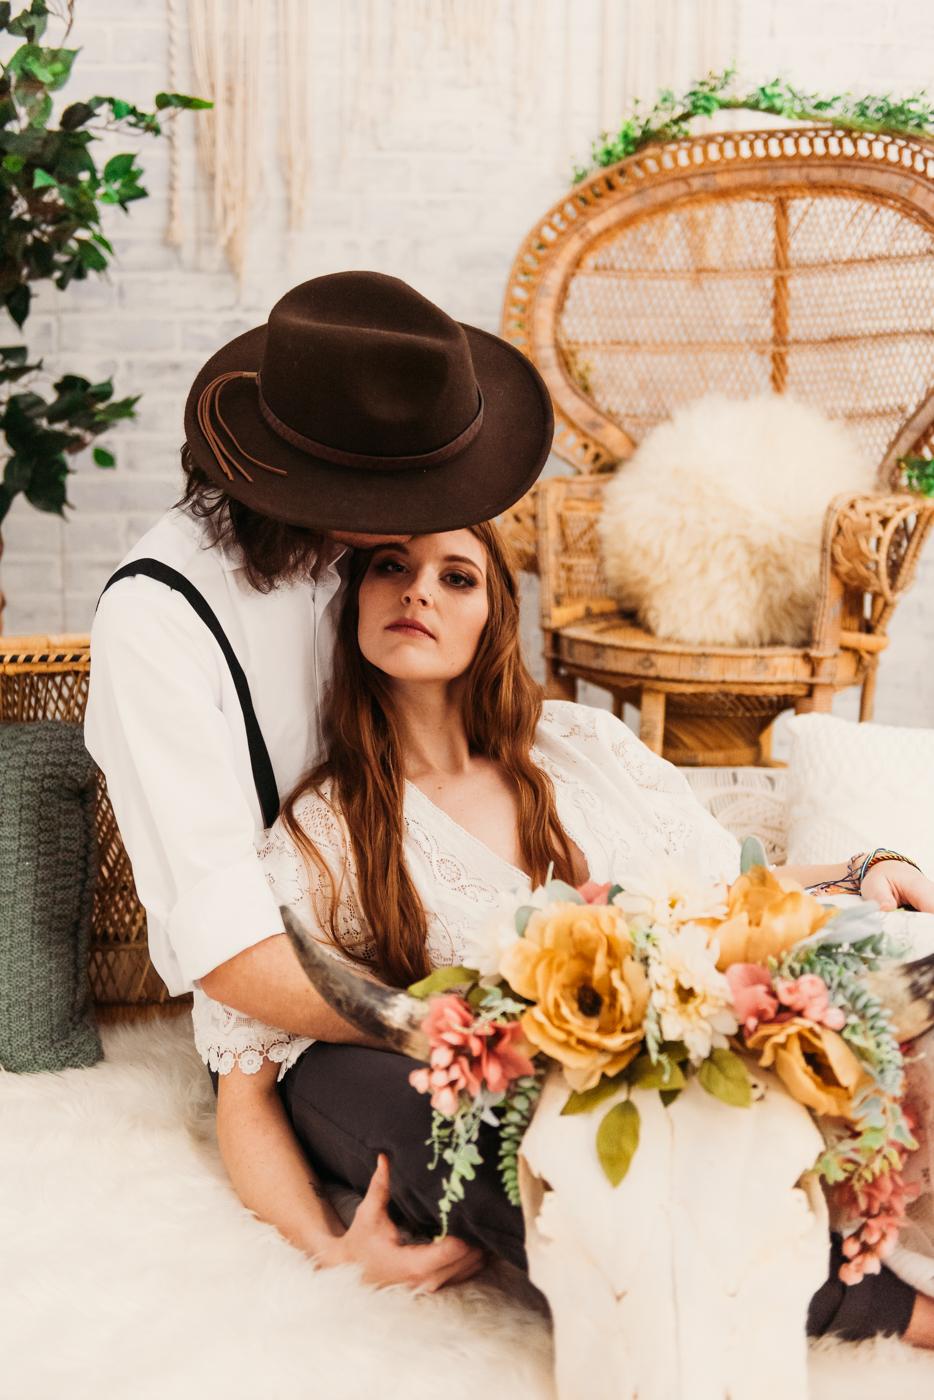 FortSt.John_photographer_TyraEPhotography_Wedding_Couple_Family_Photograhy_DawsonCreek_Elopement_Bride_Boduoir_Portraits-4802.jpg